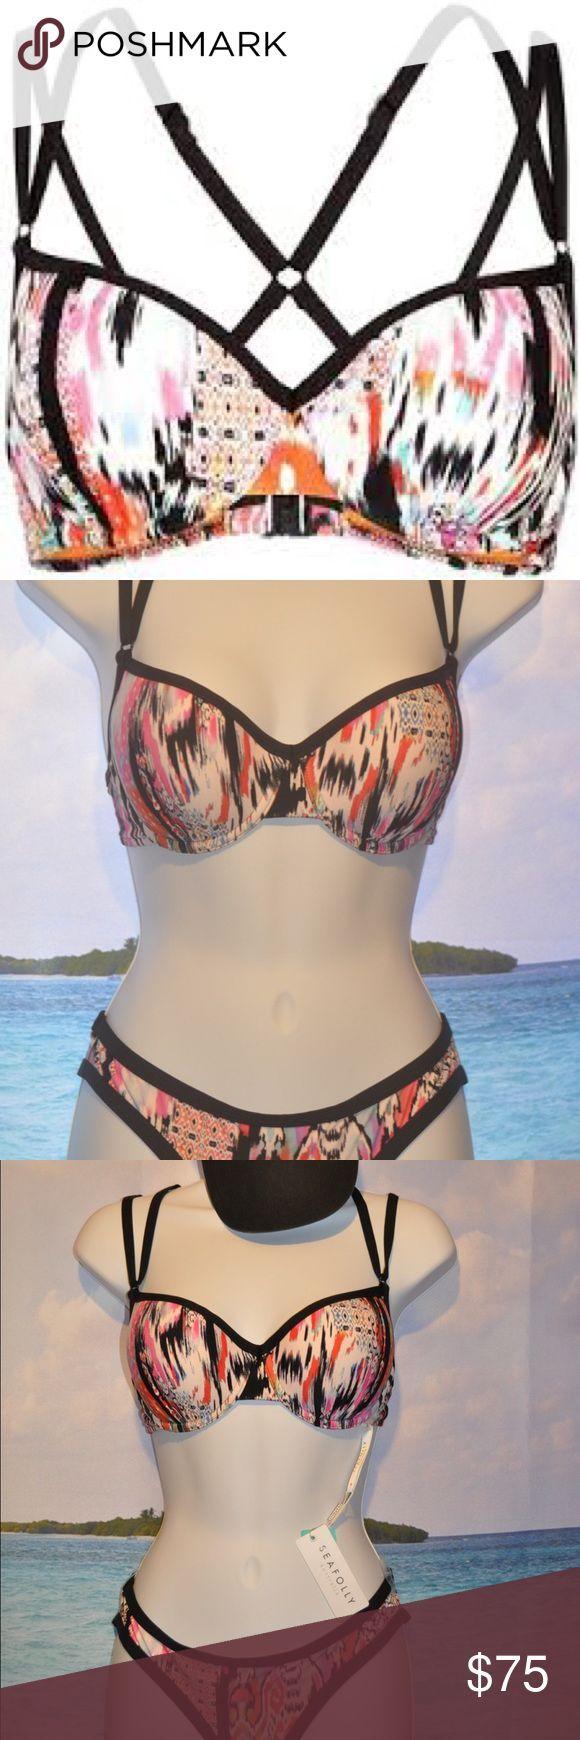 SEAFOLLY Australia Beach Gypsy D Cup Bustier Bra Bikini Top Seafolly Swim Bikinis